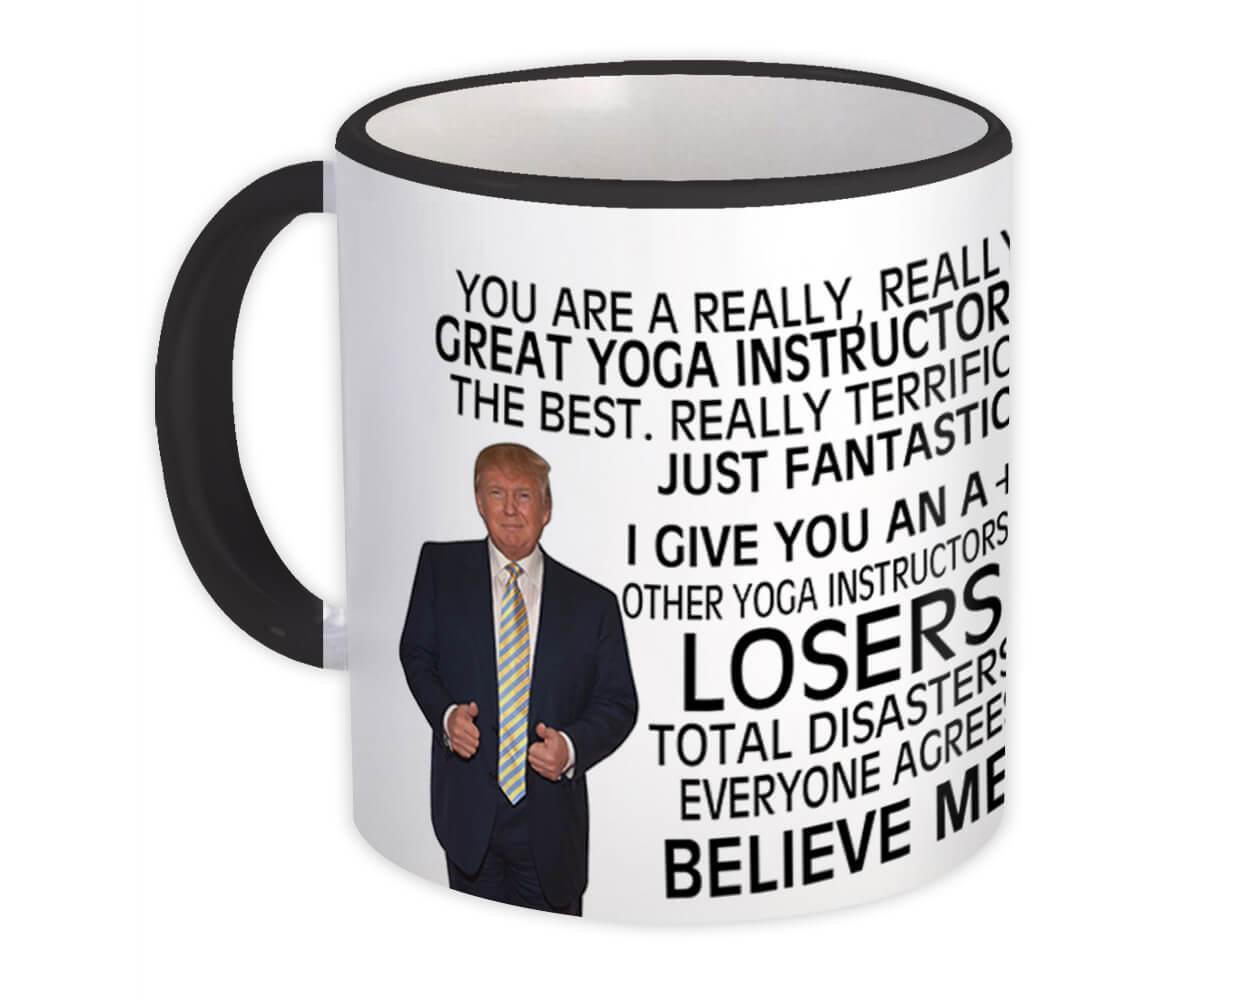 Gift for Yoga Instructor : Gift Mug Donald Trump Great Yoga Instructor Funny Christmas